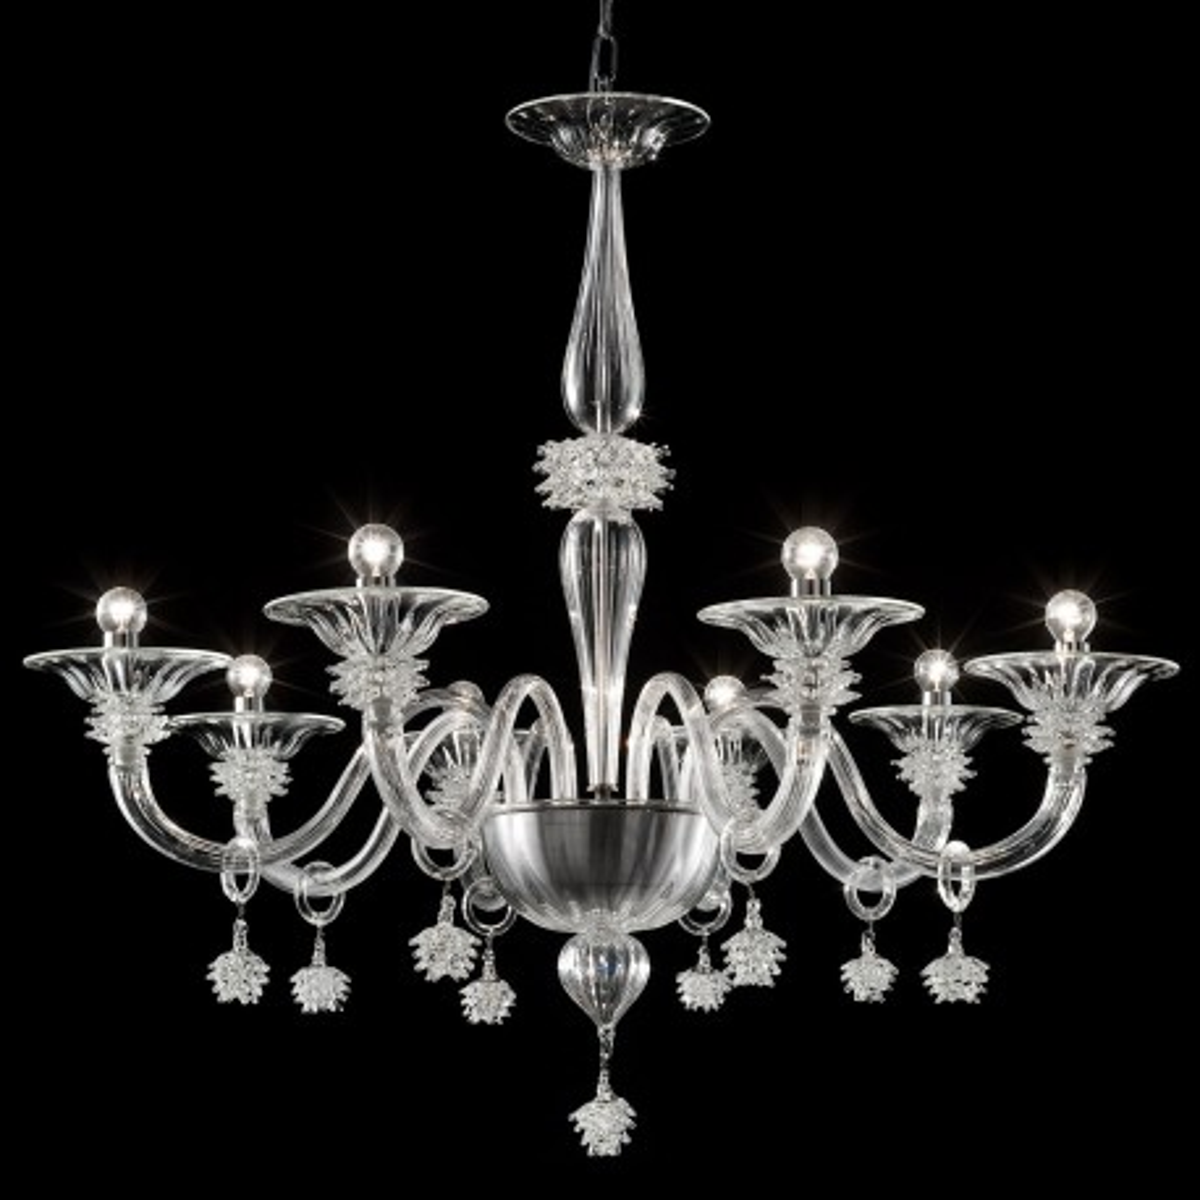 """Magellano"" lustre en verre de Murano - 8 lumieres - transparent"